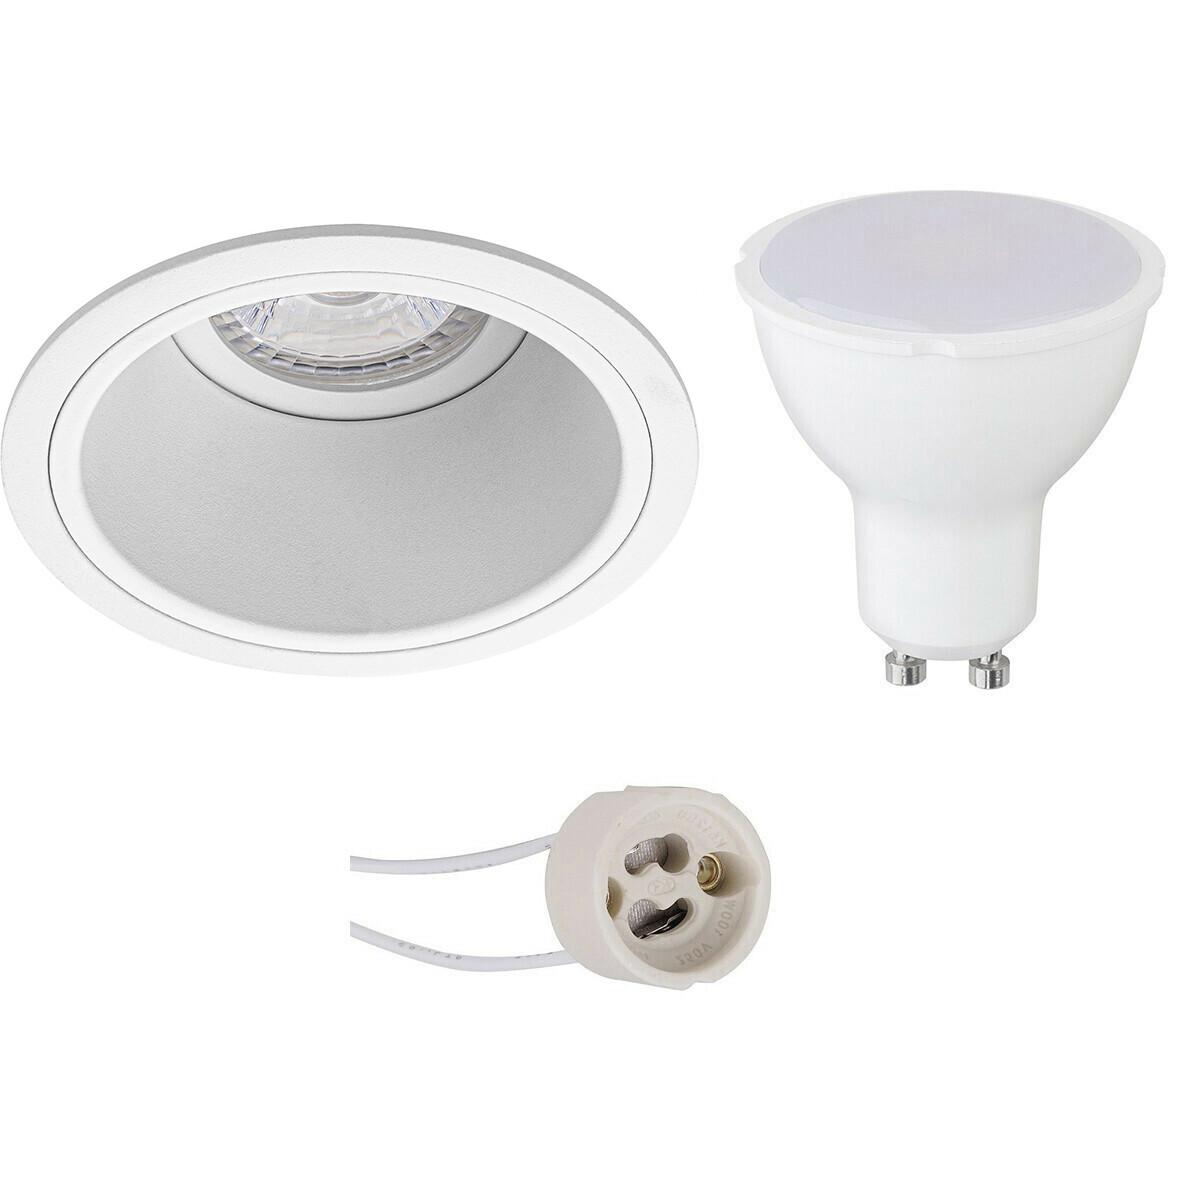 LED Spot Set - Aigi - Pragmi Minko Pro - GU10 Fitting - Inbouw Rond - Mat Wit - 8W - Helder/Koud Wit